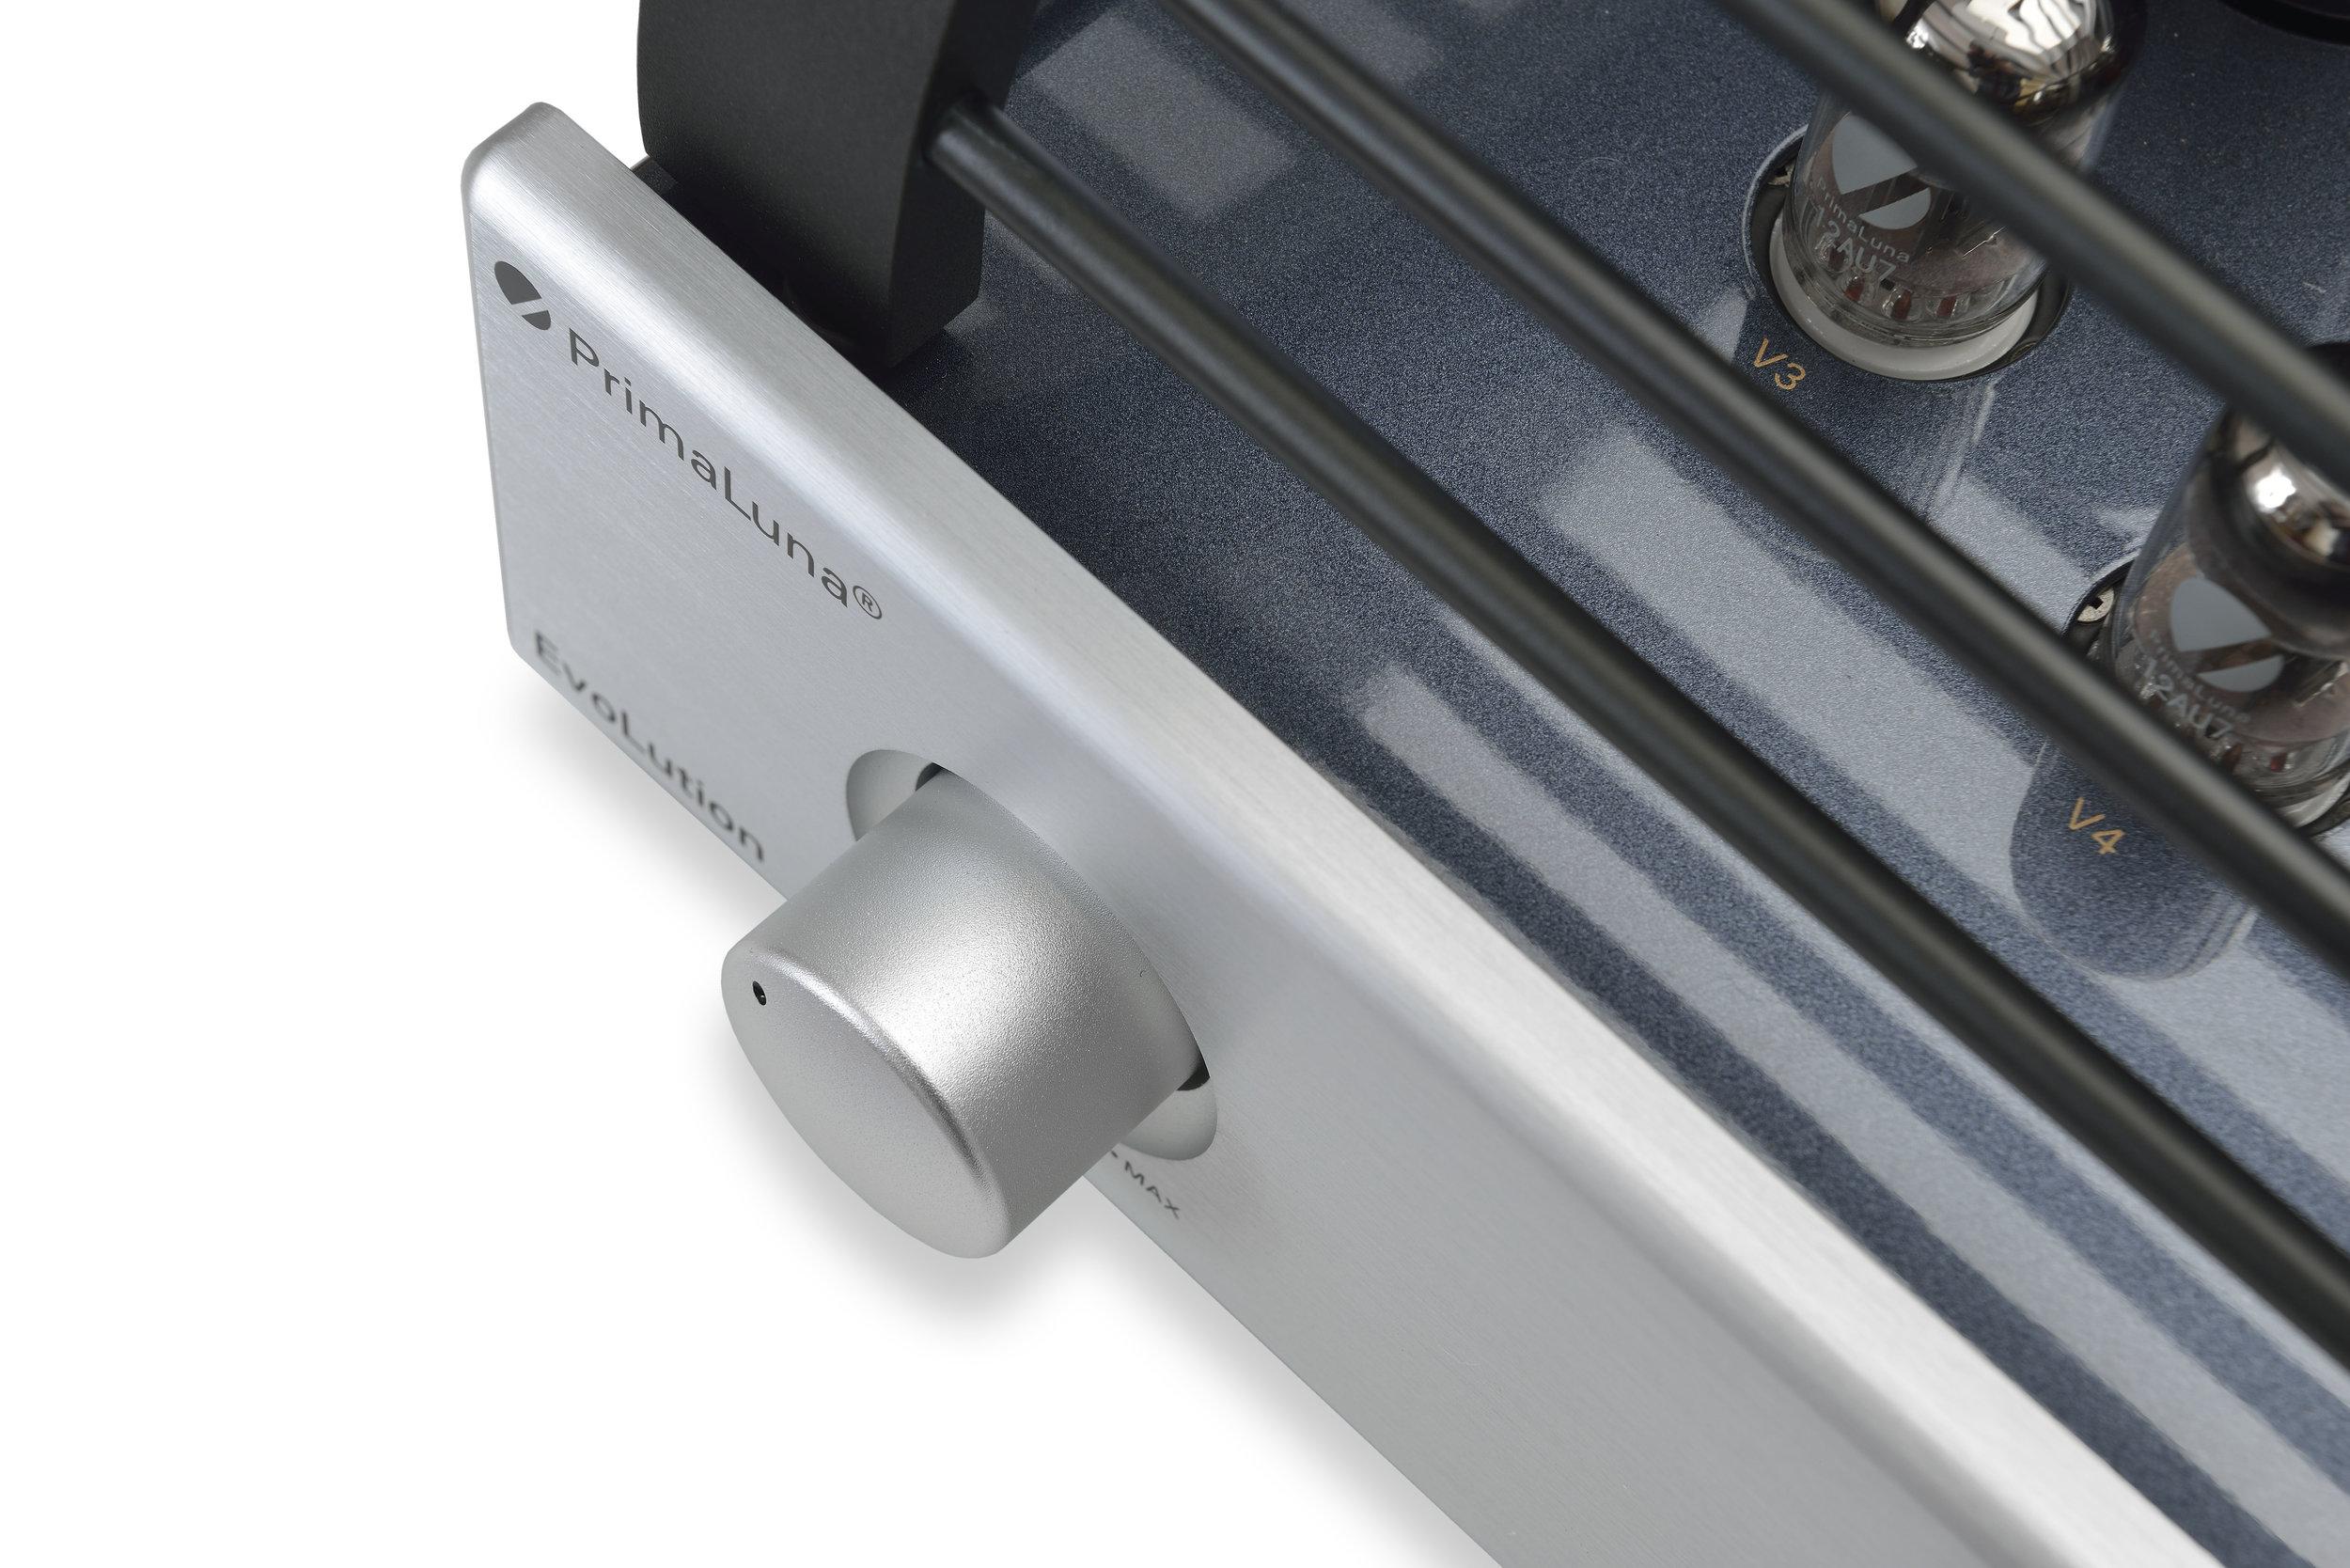 021b - PrimaLuna Evo 300 Tube Preamplifier - silver - artistic - white background.jpg